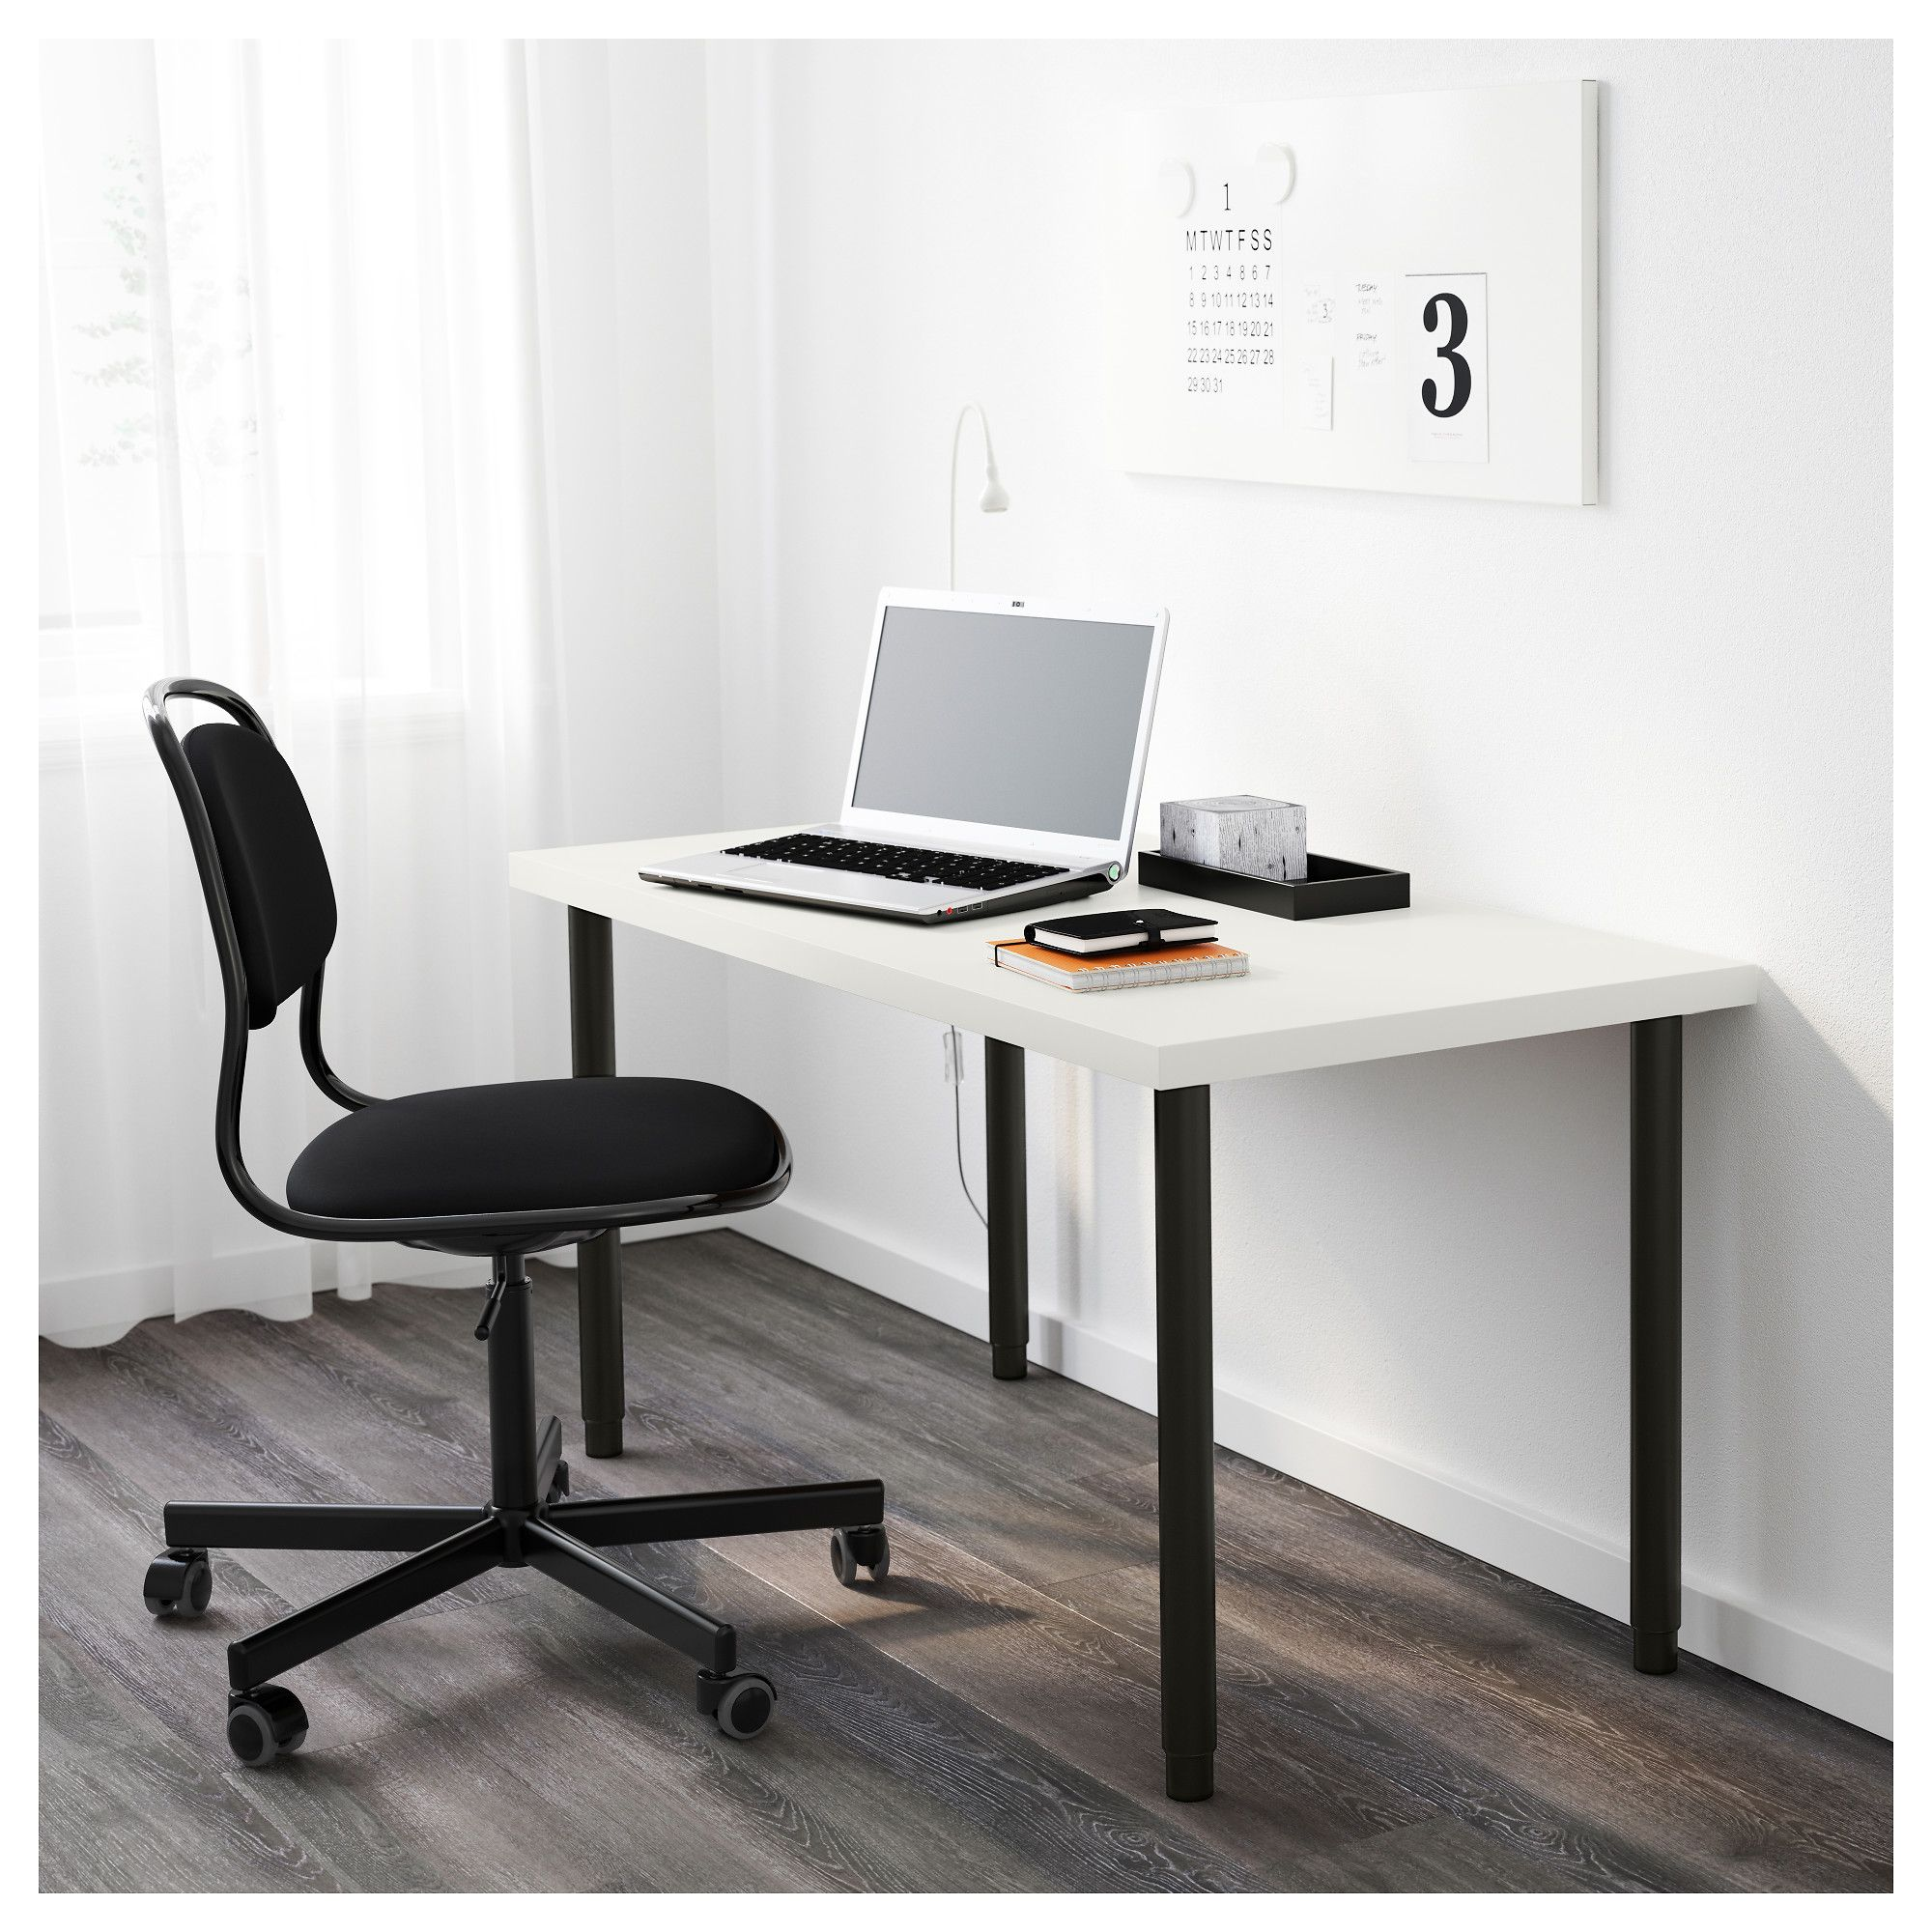 Linnmon Olov Table White Black Ikea Luxury Desk Furniture Home Furnishings